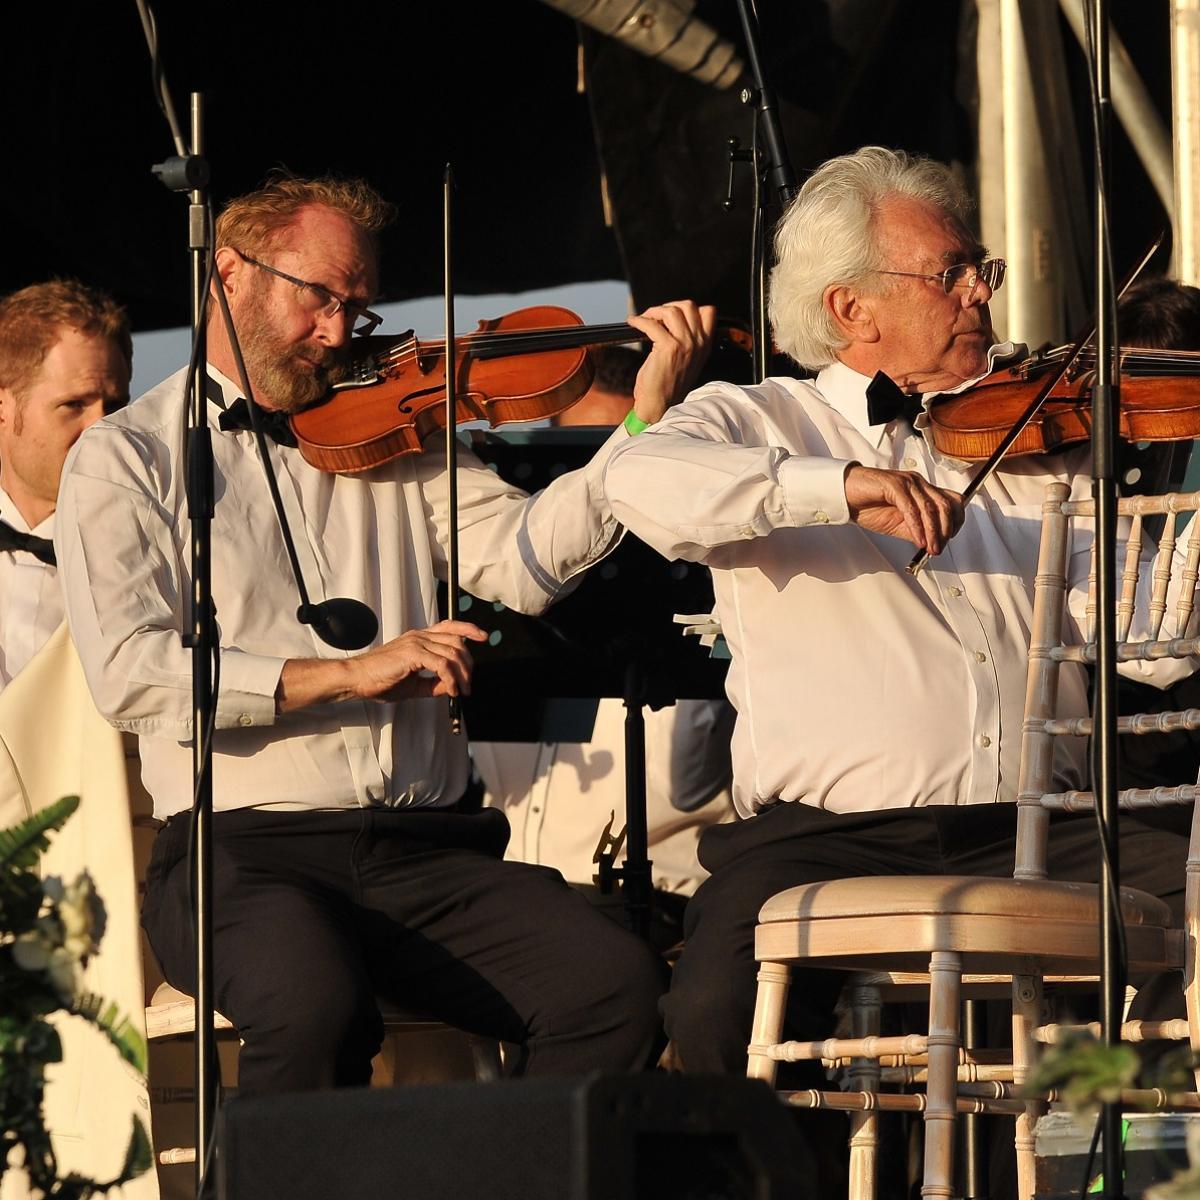 Battle Proms Picnic Concert 2021 at Blenheim Palace - Gallery Image 01